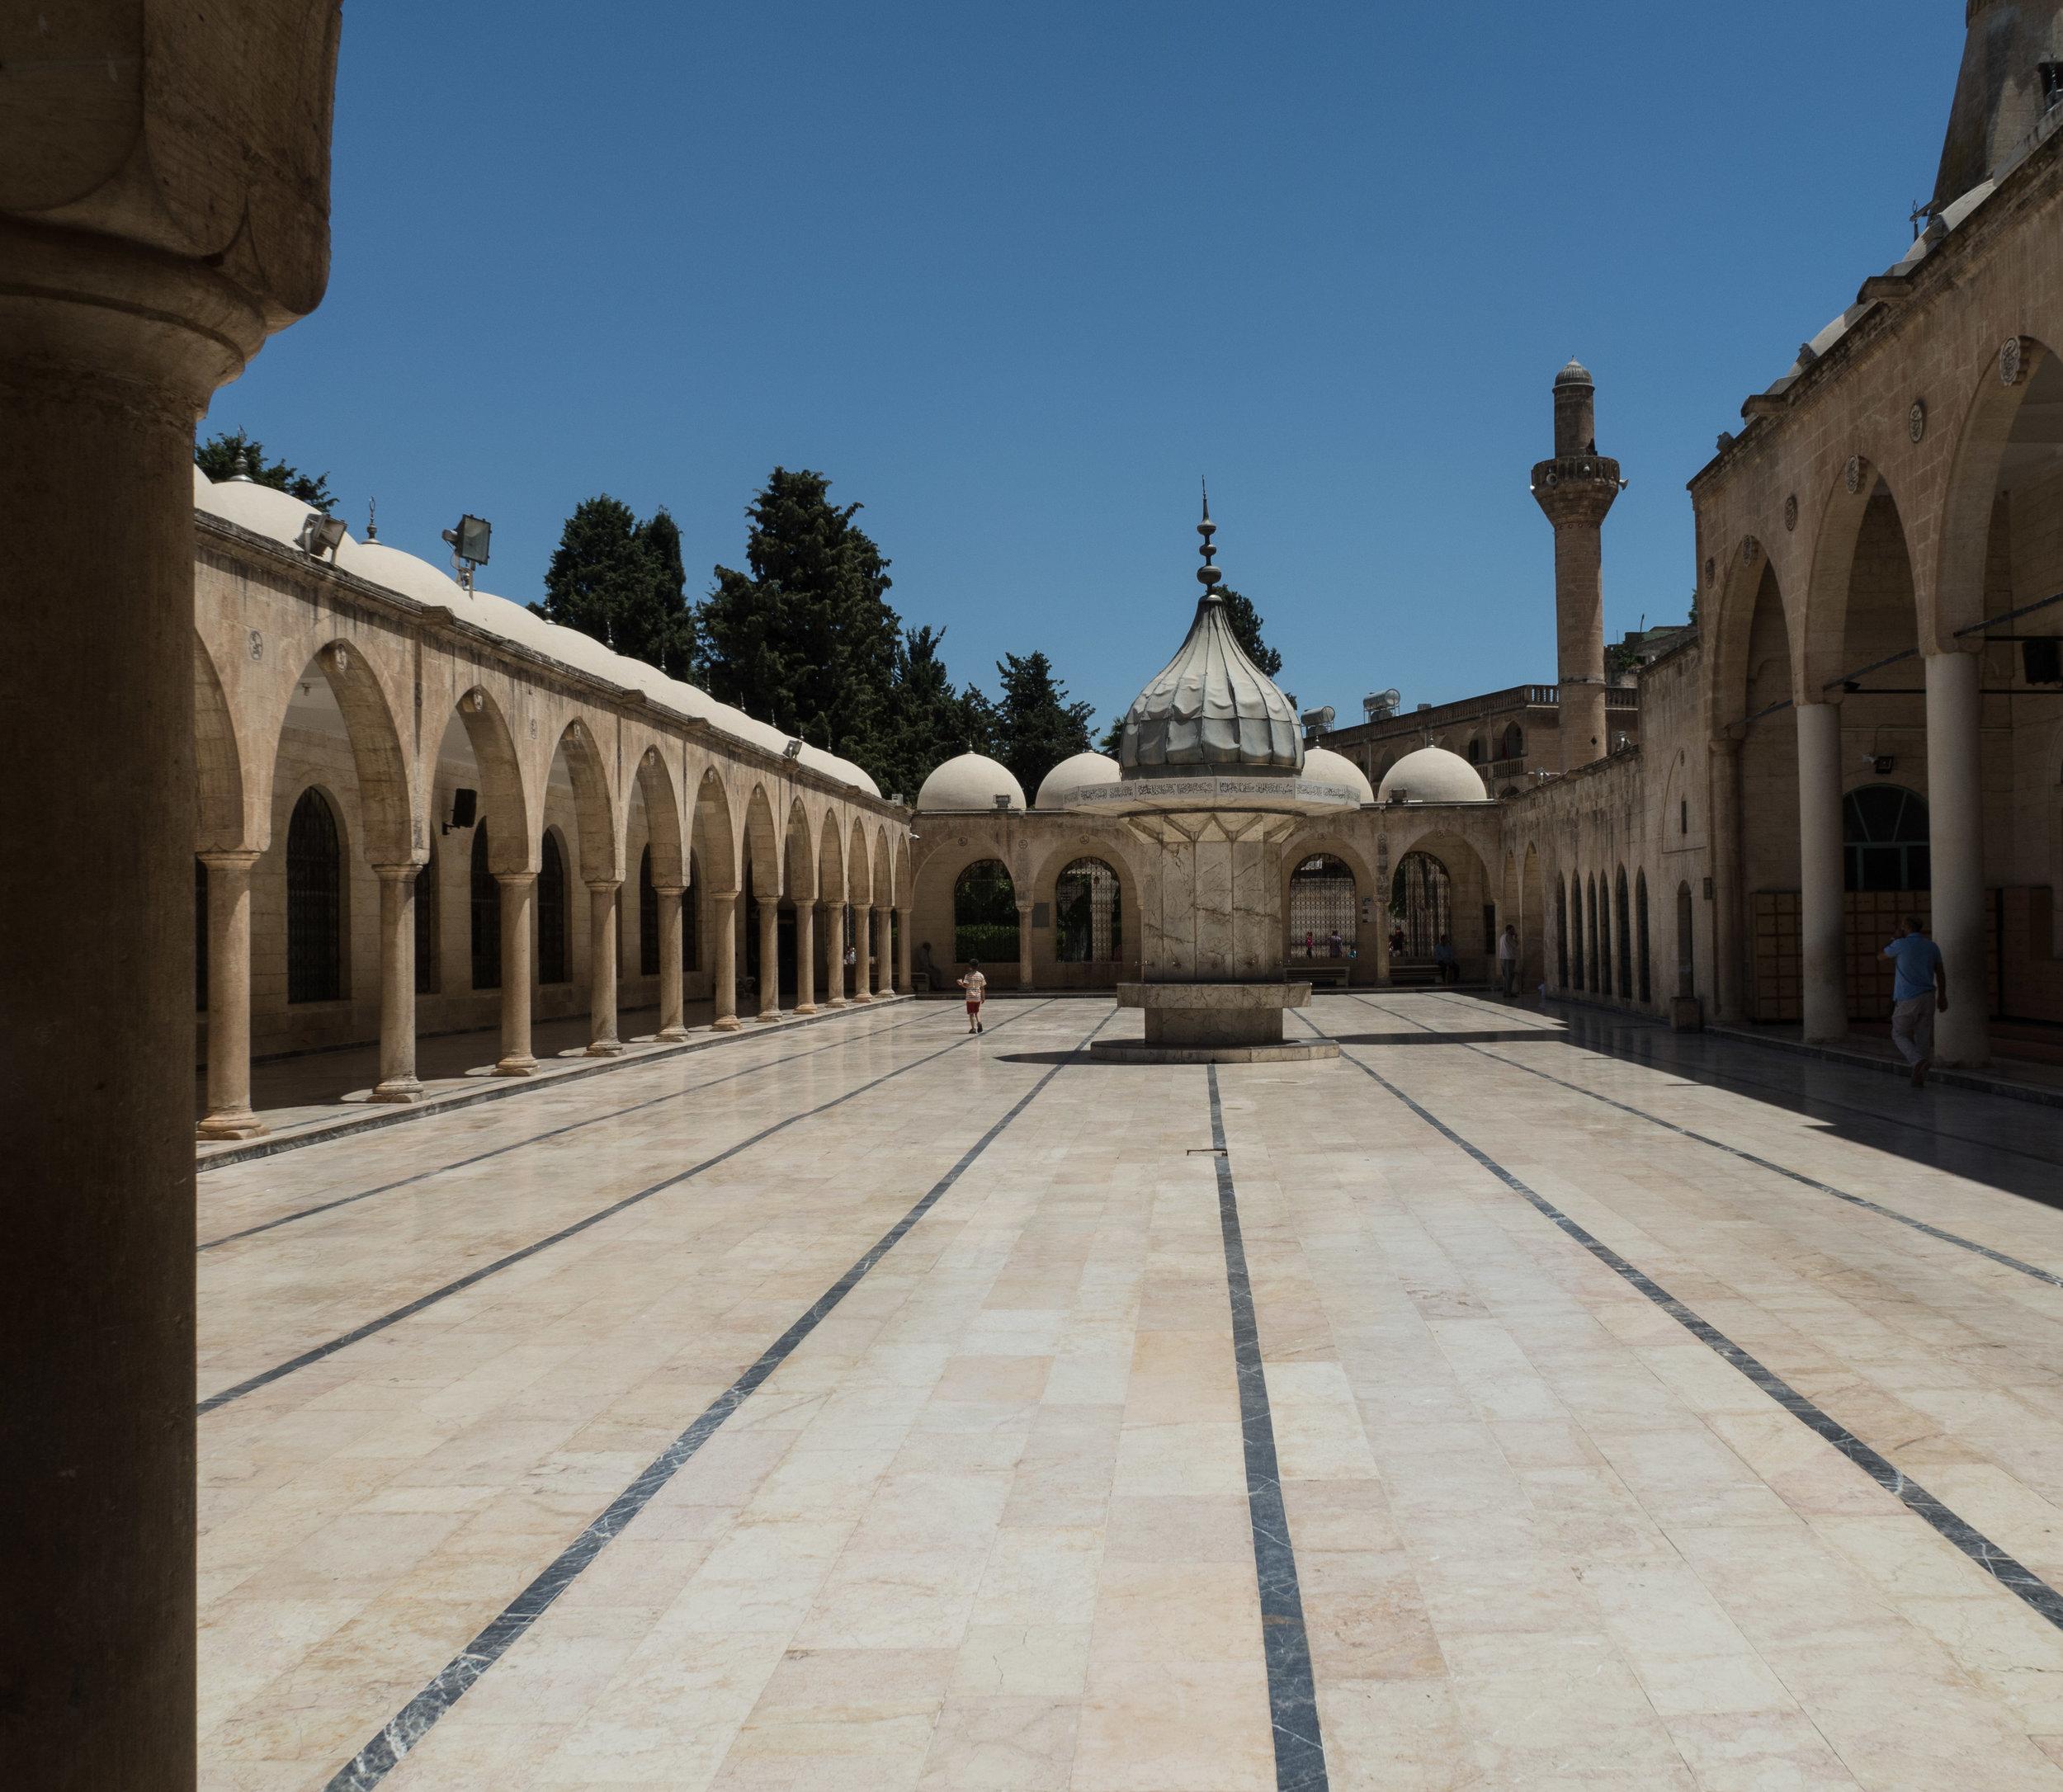 Mevlid Halil Mosque